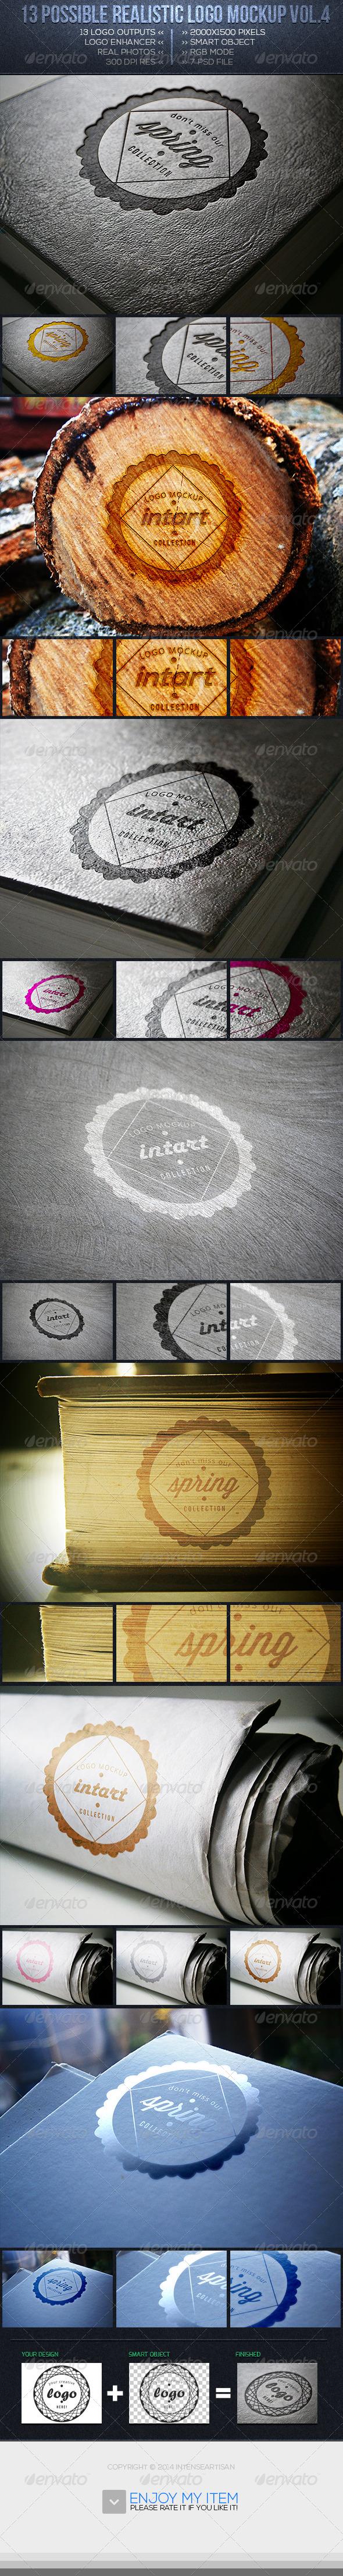 Realistic Logo Mockup Vol.4 - Logo Product Mock-Ups